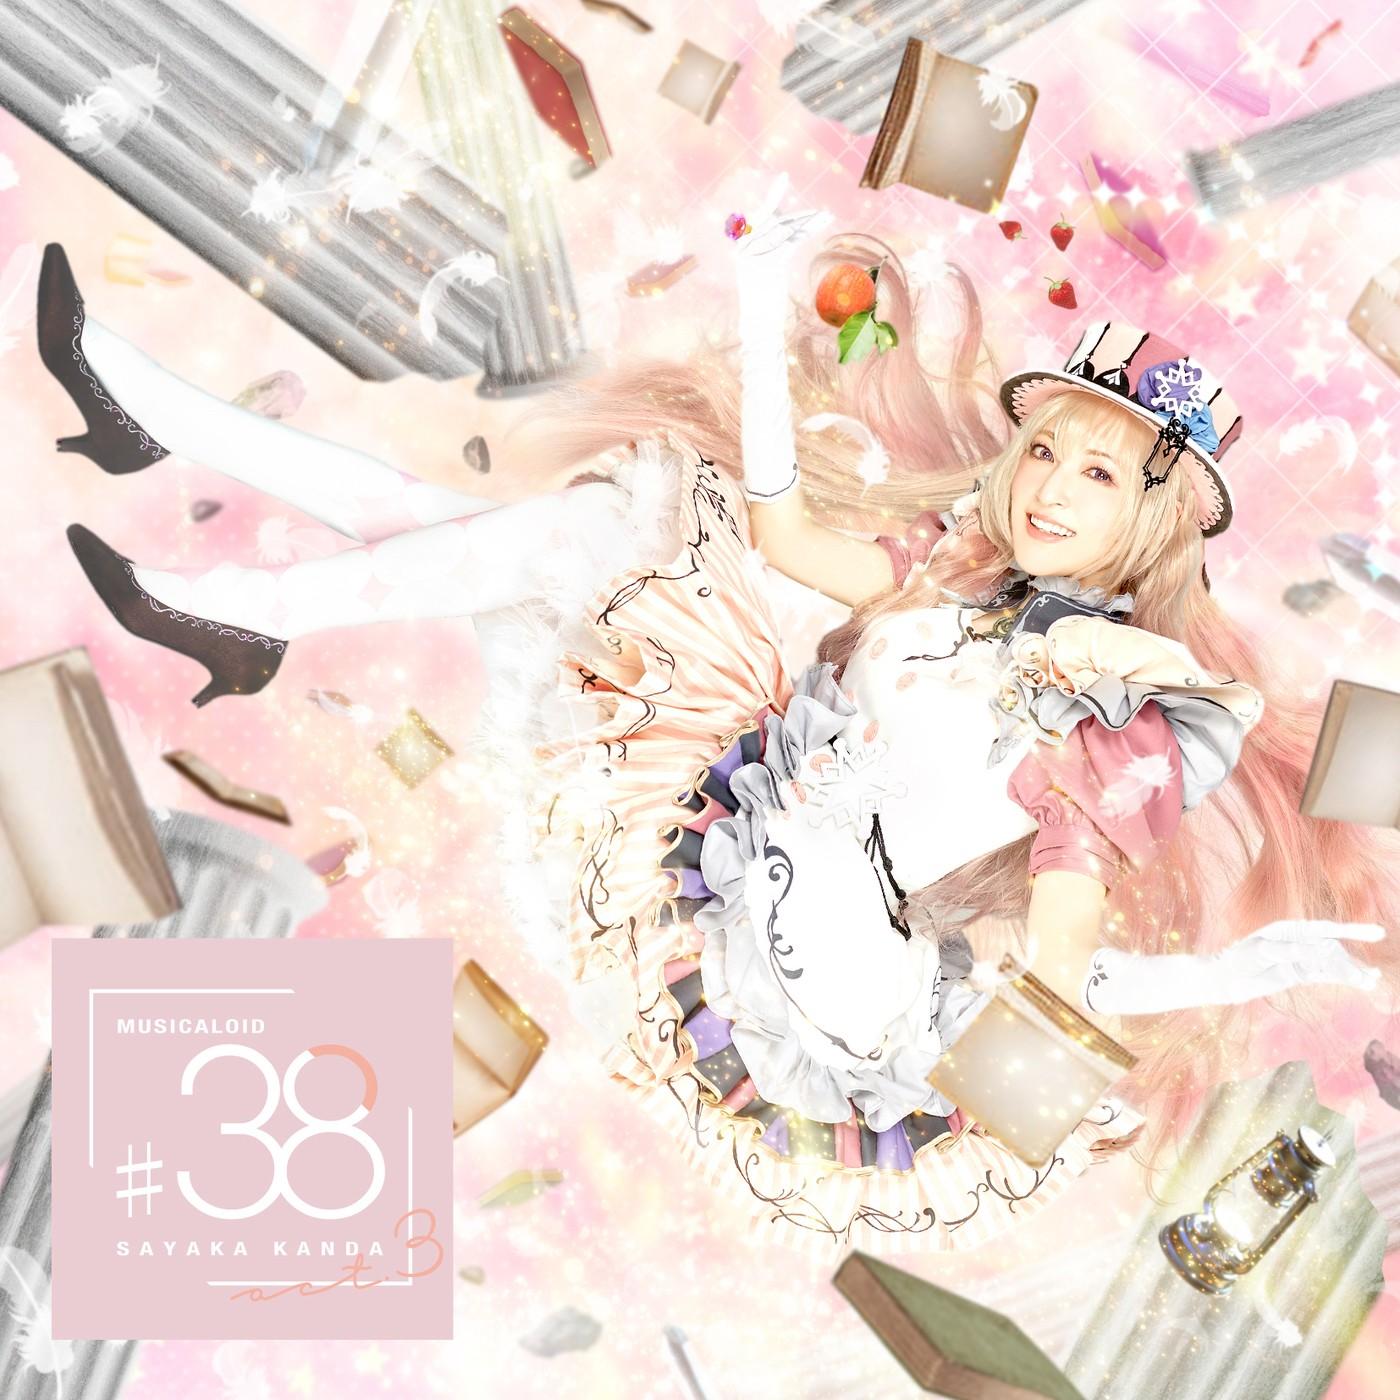 Sayaka Kanda - MUSICALOID #38 Act.3